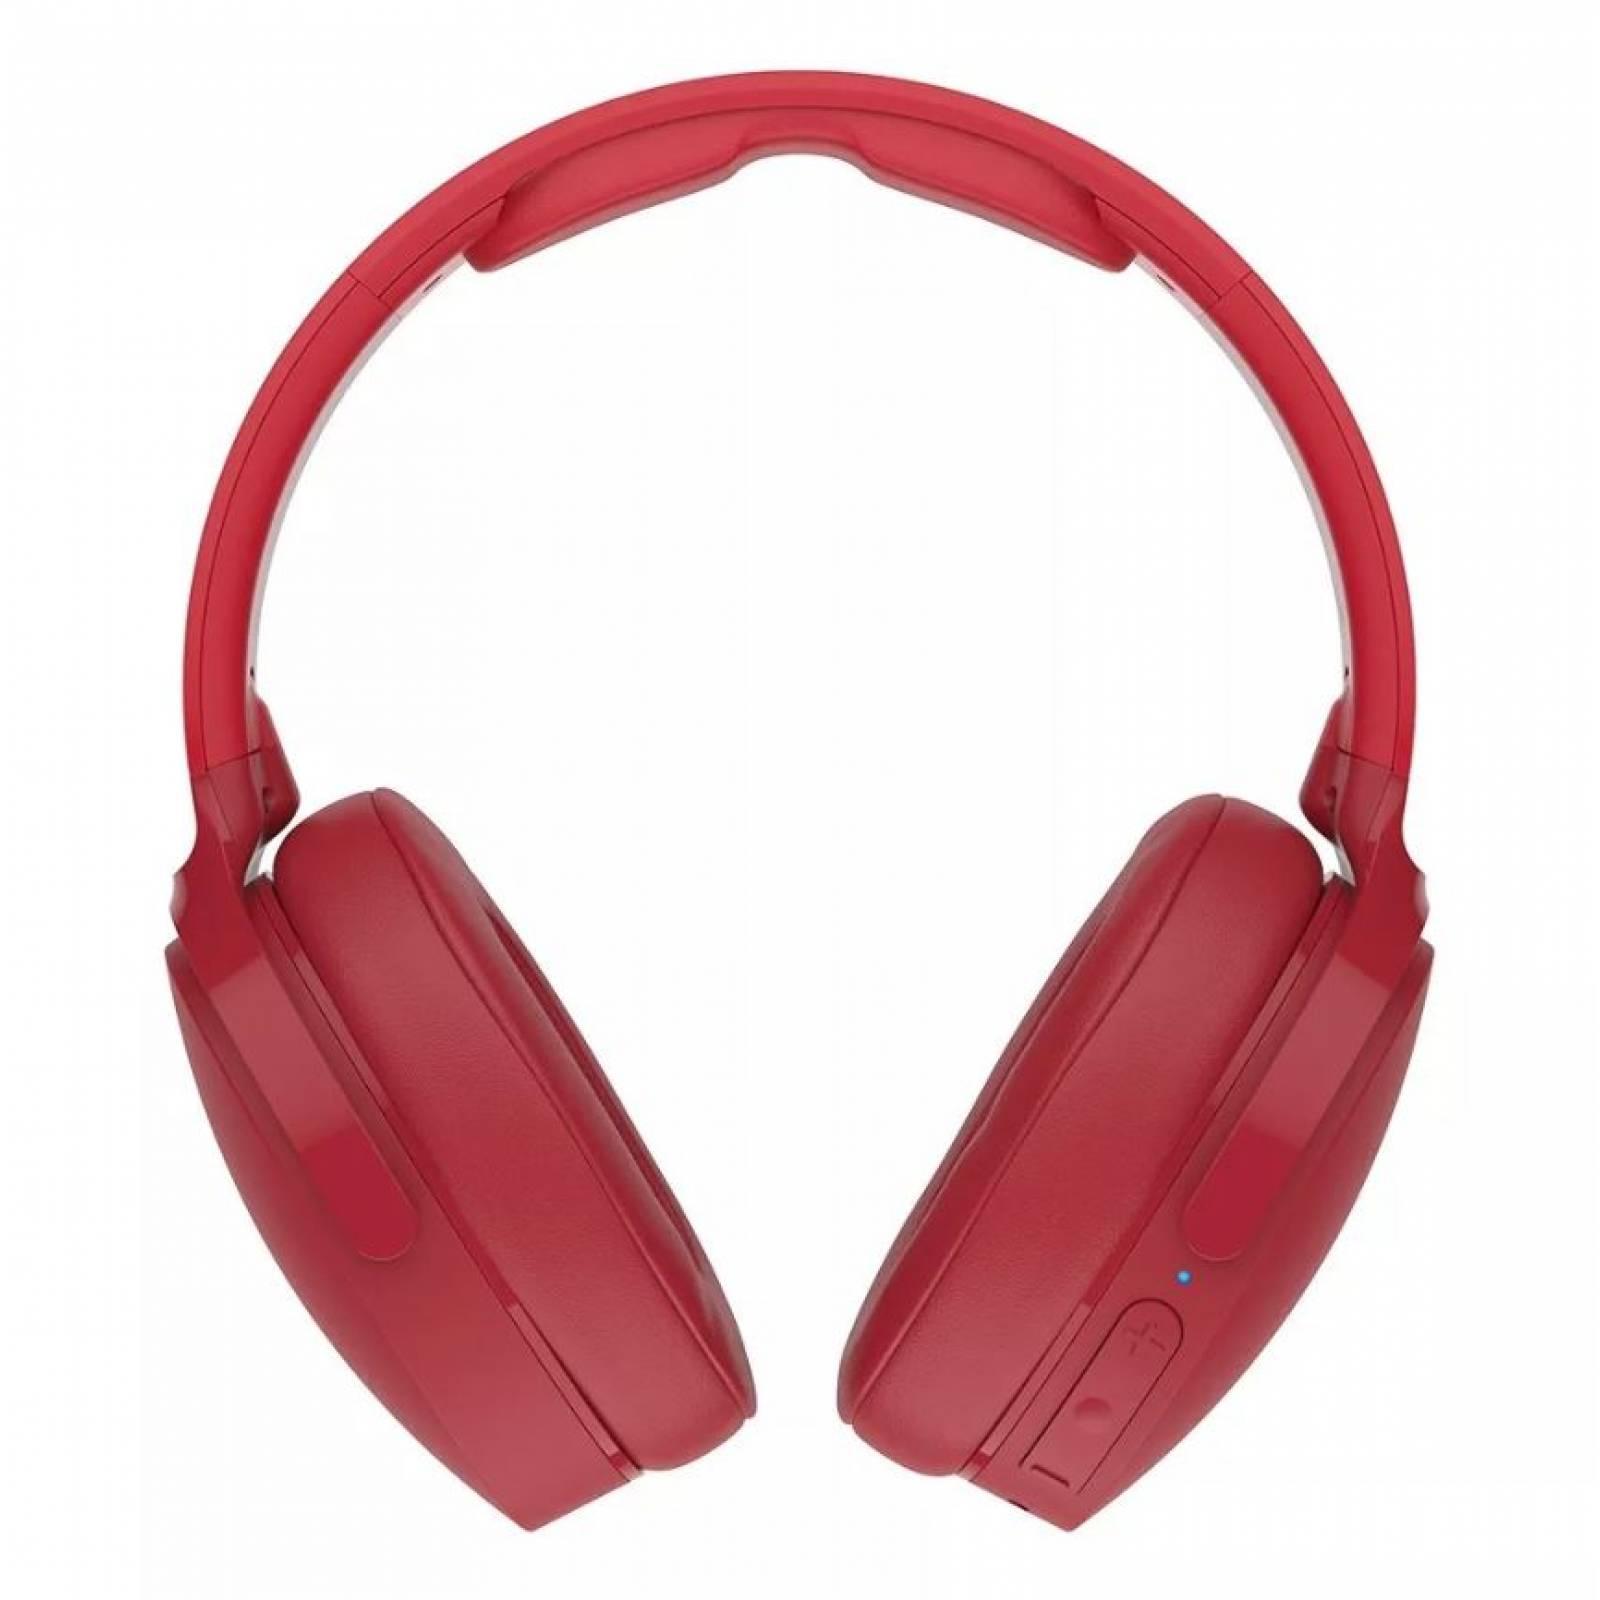 Audifonos Skullcandy HESH 3 Rojo S6HTW-K613